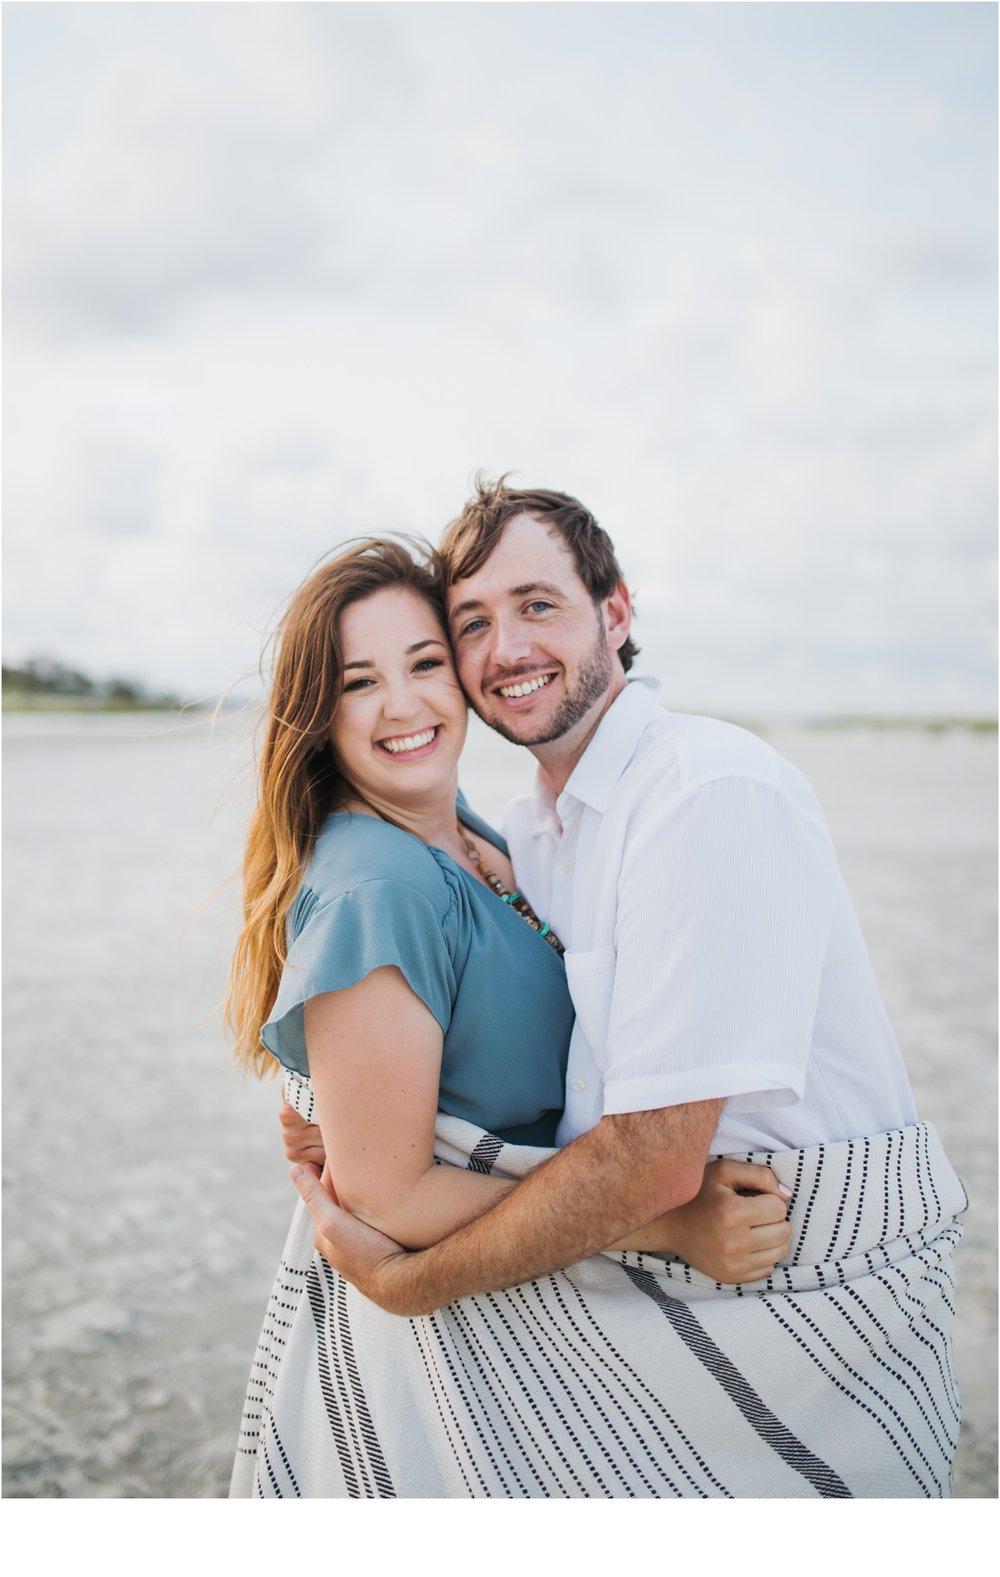 Rainey_Gregg_Photography_St._Simons_Island_Georgia_California_Wedding_Portrait_Photography_1168.jpg